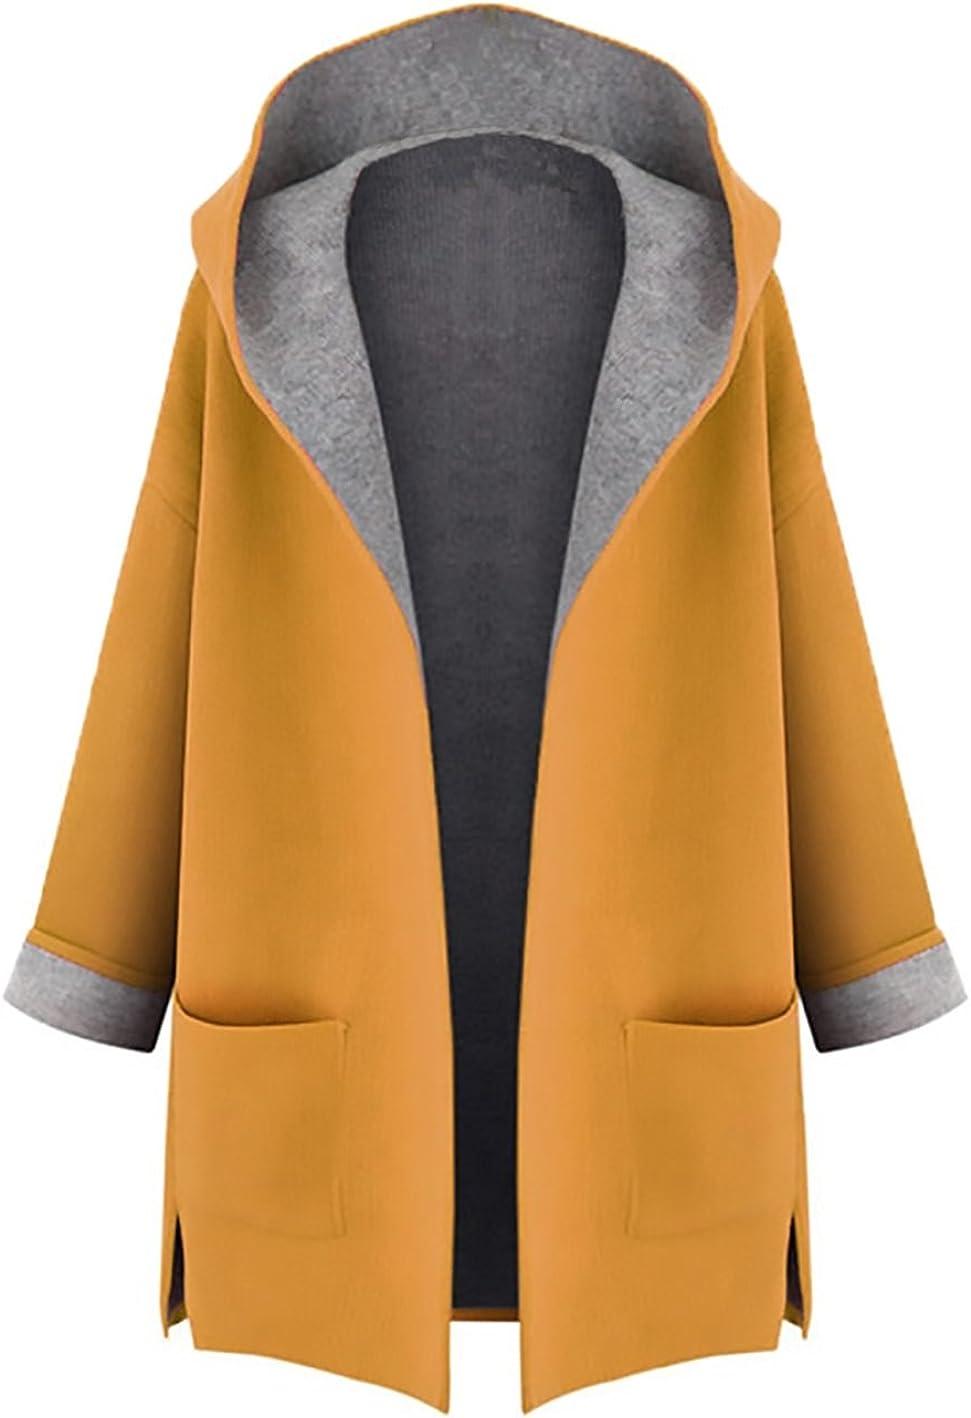 Minetom Mujer Otoño Invierno Suelto Abrigos con Capucha Moda Parka Trench Coat Elegante Bolsillos Chaquetas Tallas Grandes